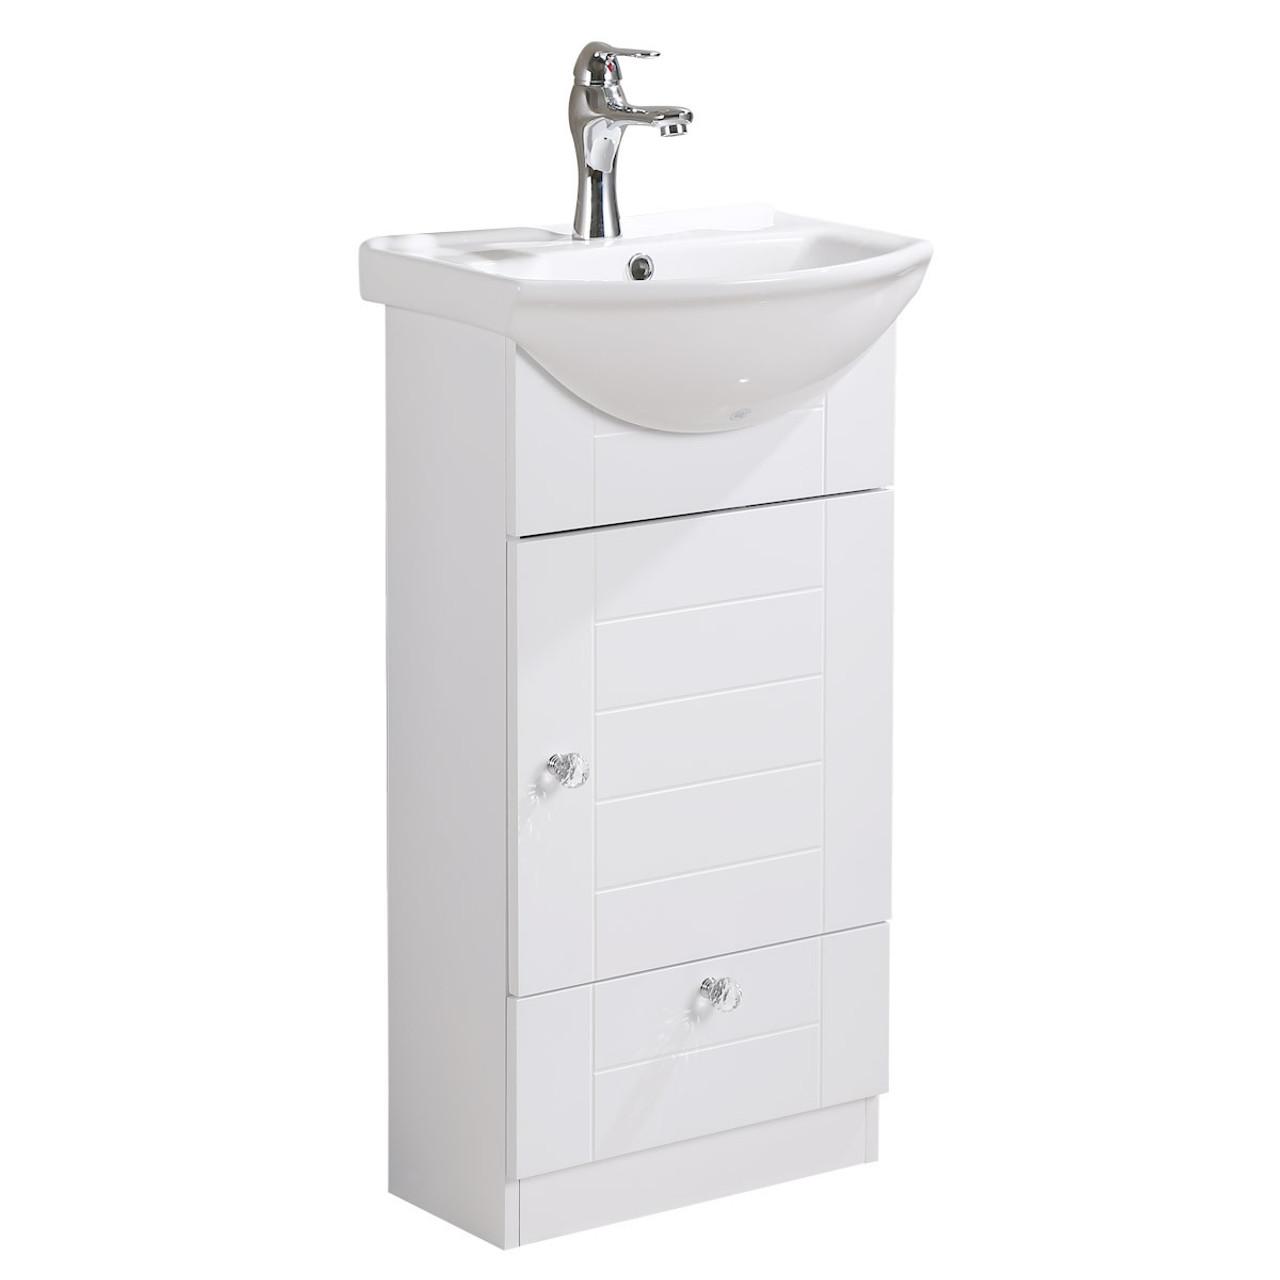 Lorixon LV-1001W White Bathroom Vanity Ceramic Sink White Cabinet with  Drawer 18inches Modern